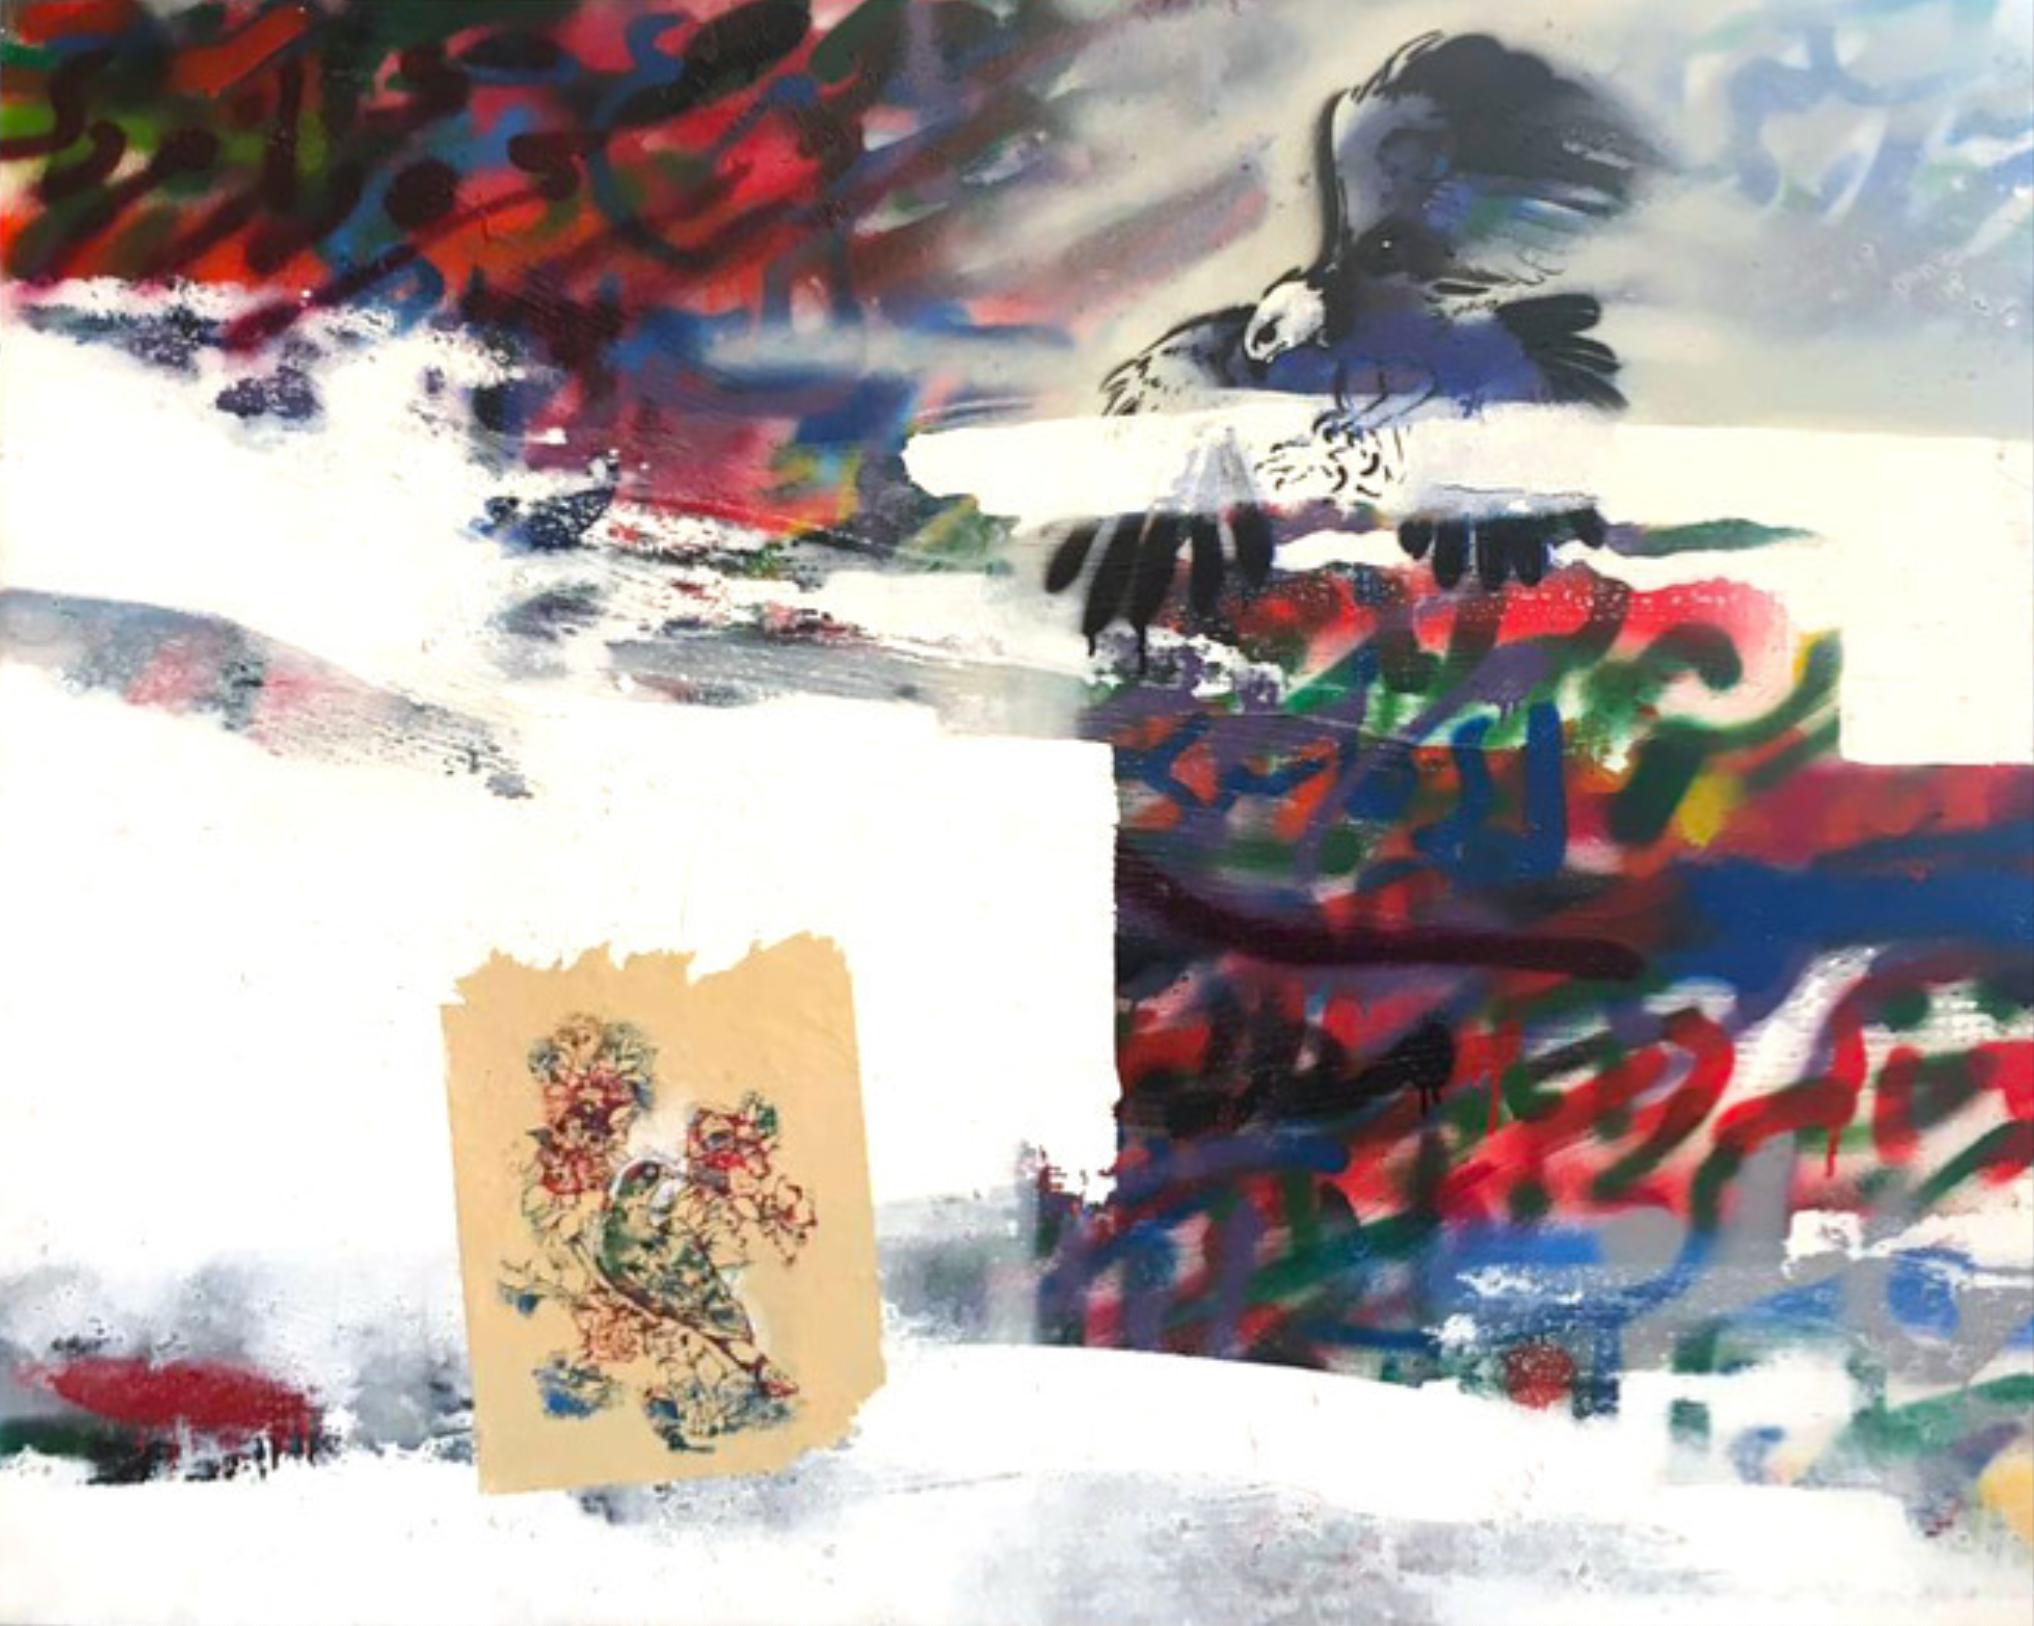 Mehdi Sahabi, Untitled, mixed media on canvas, 2006